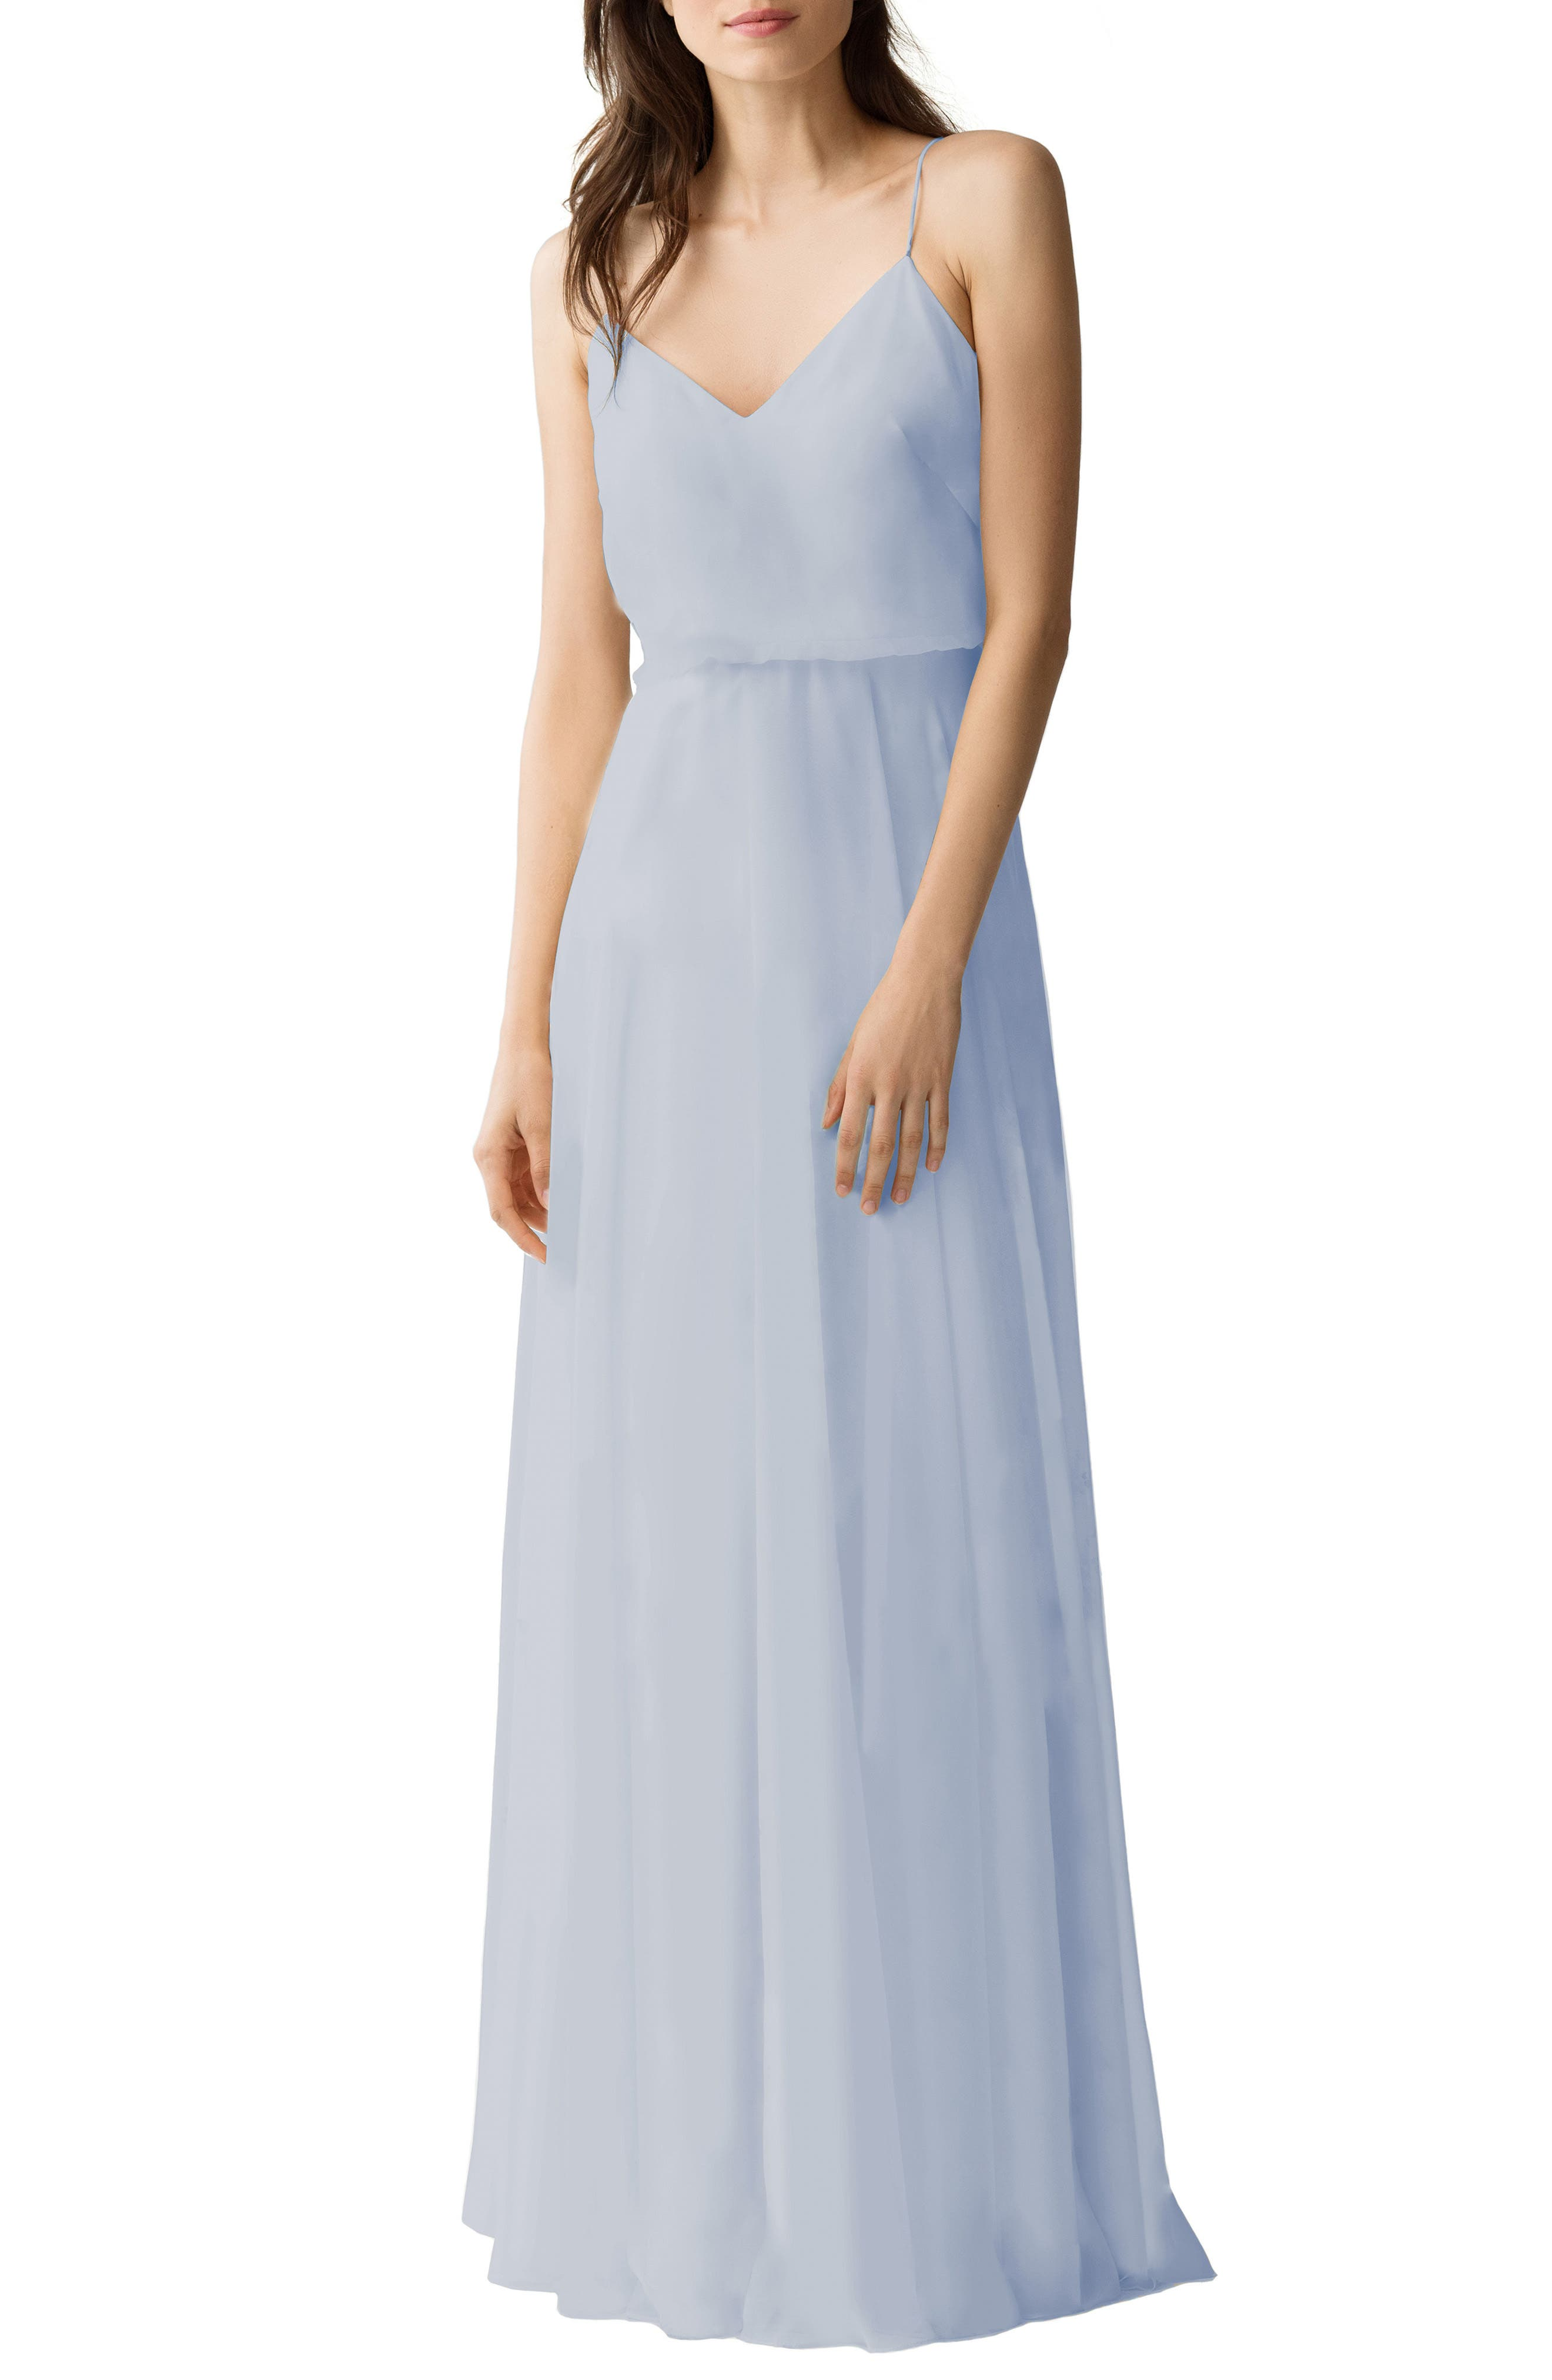 Inesse Chiffon V-Neck Spaghetti Strap Gown,                         Main,                         color, Whisper Blue